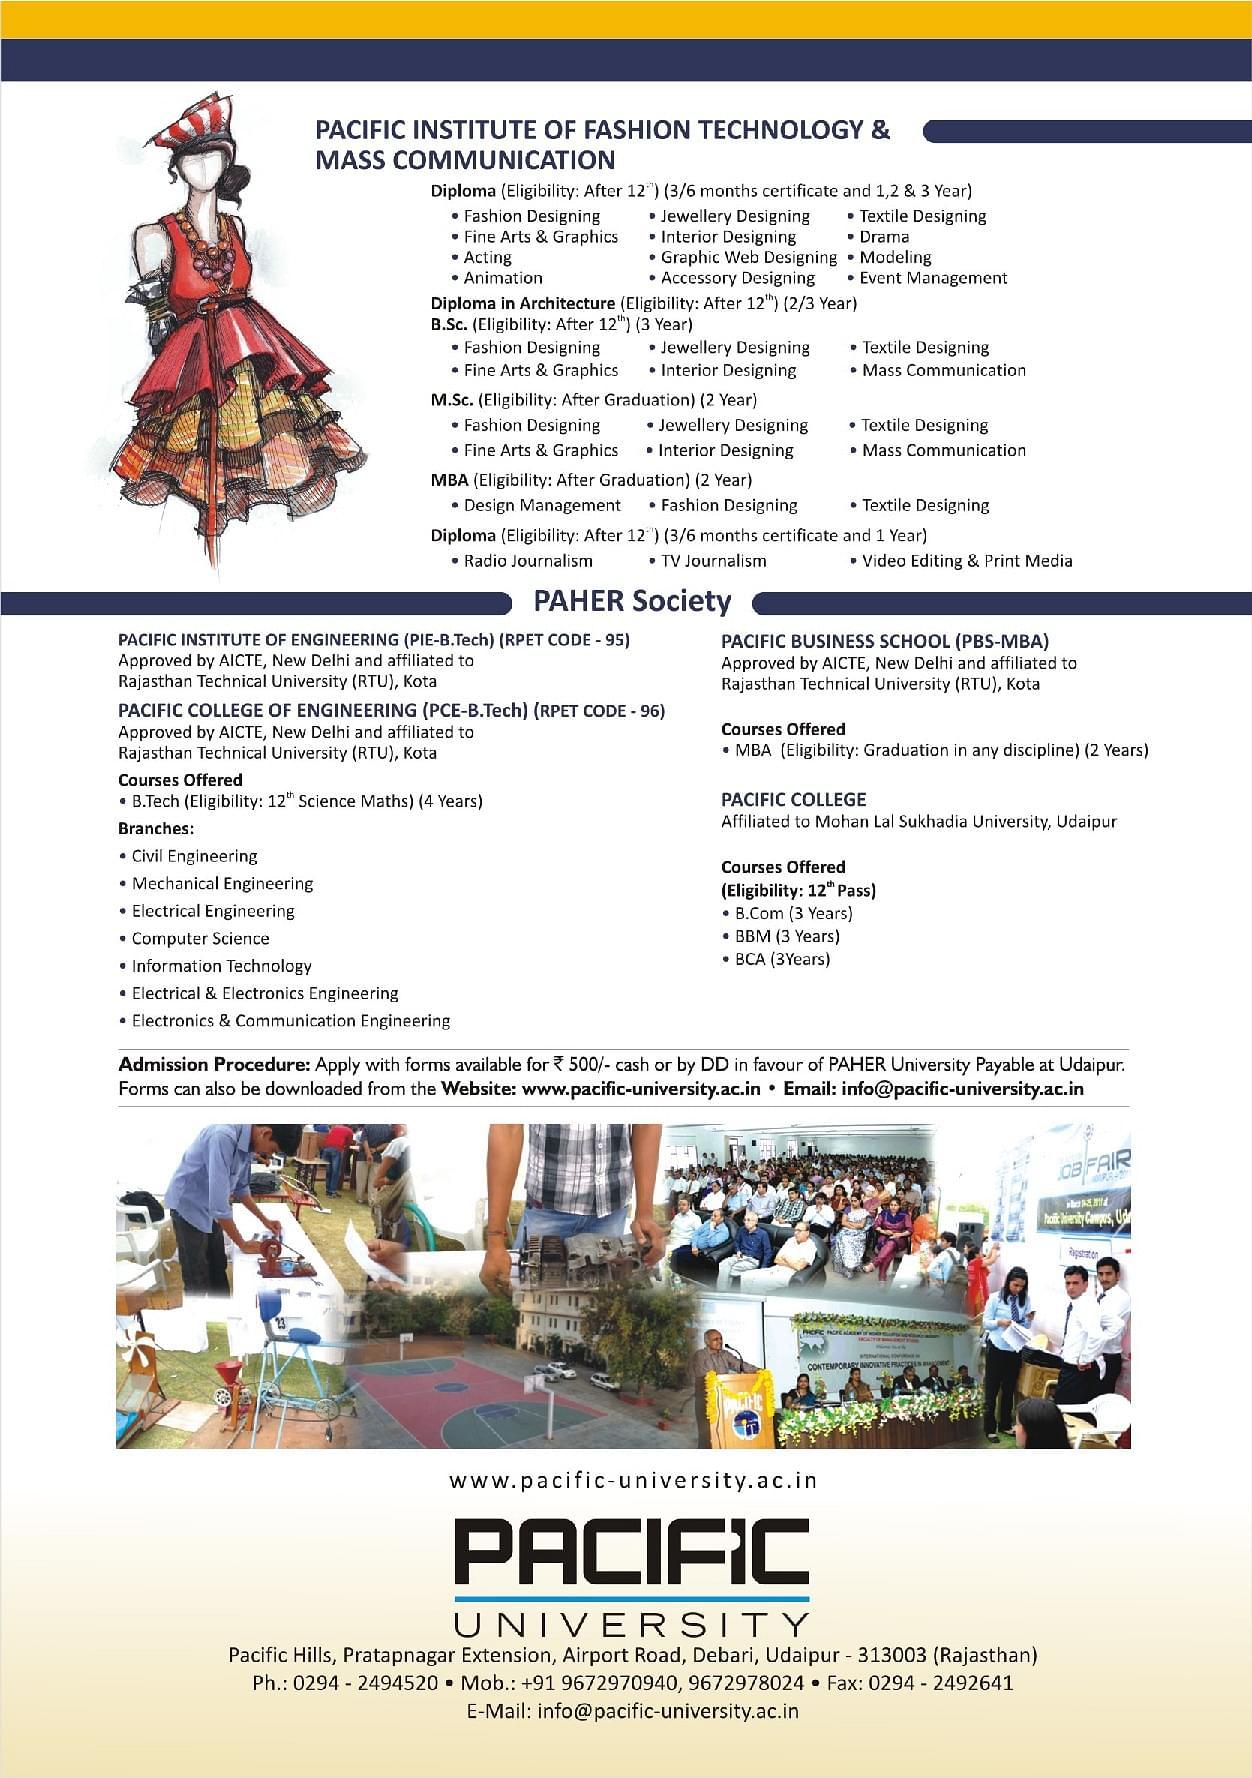 Payday loans shops salford image 1